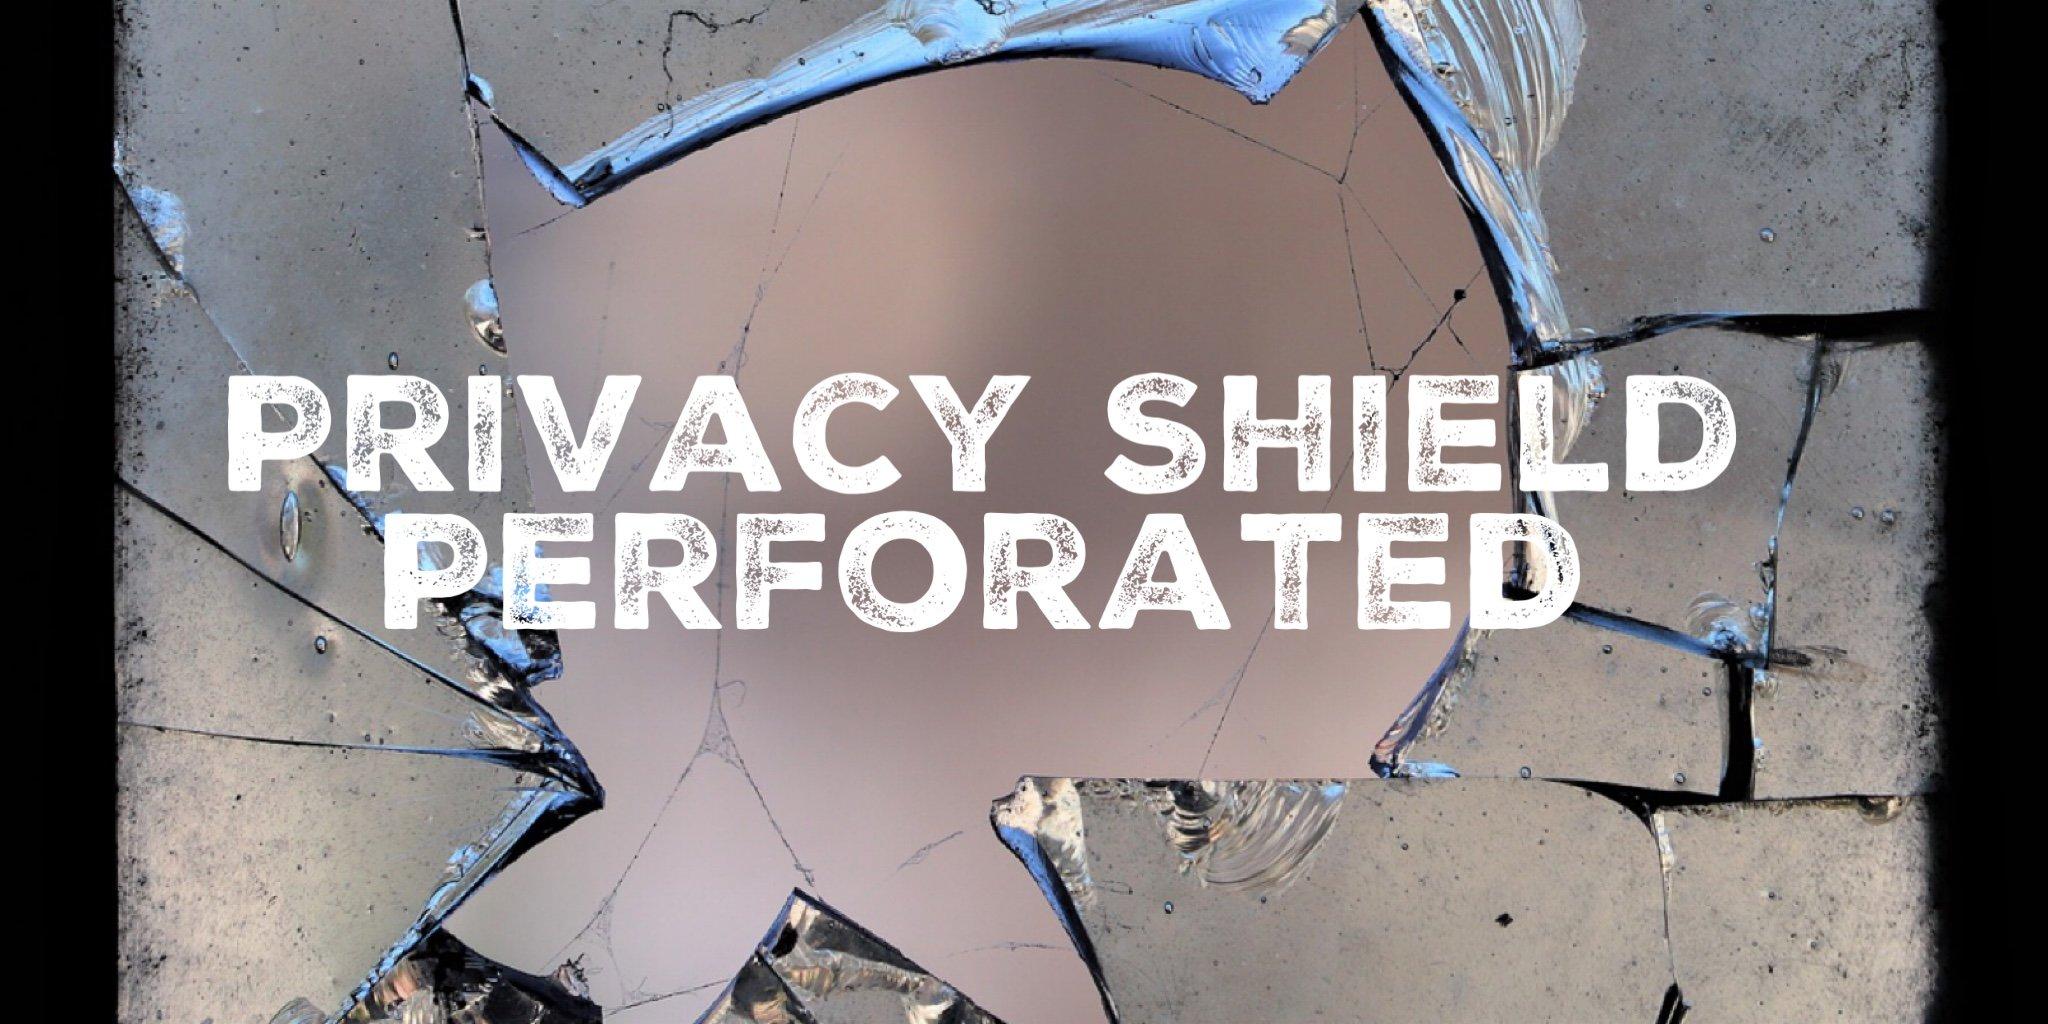 Privacy Shield typorama